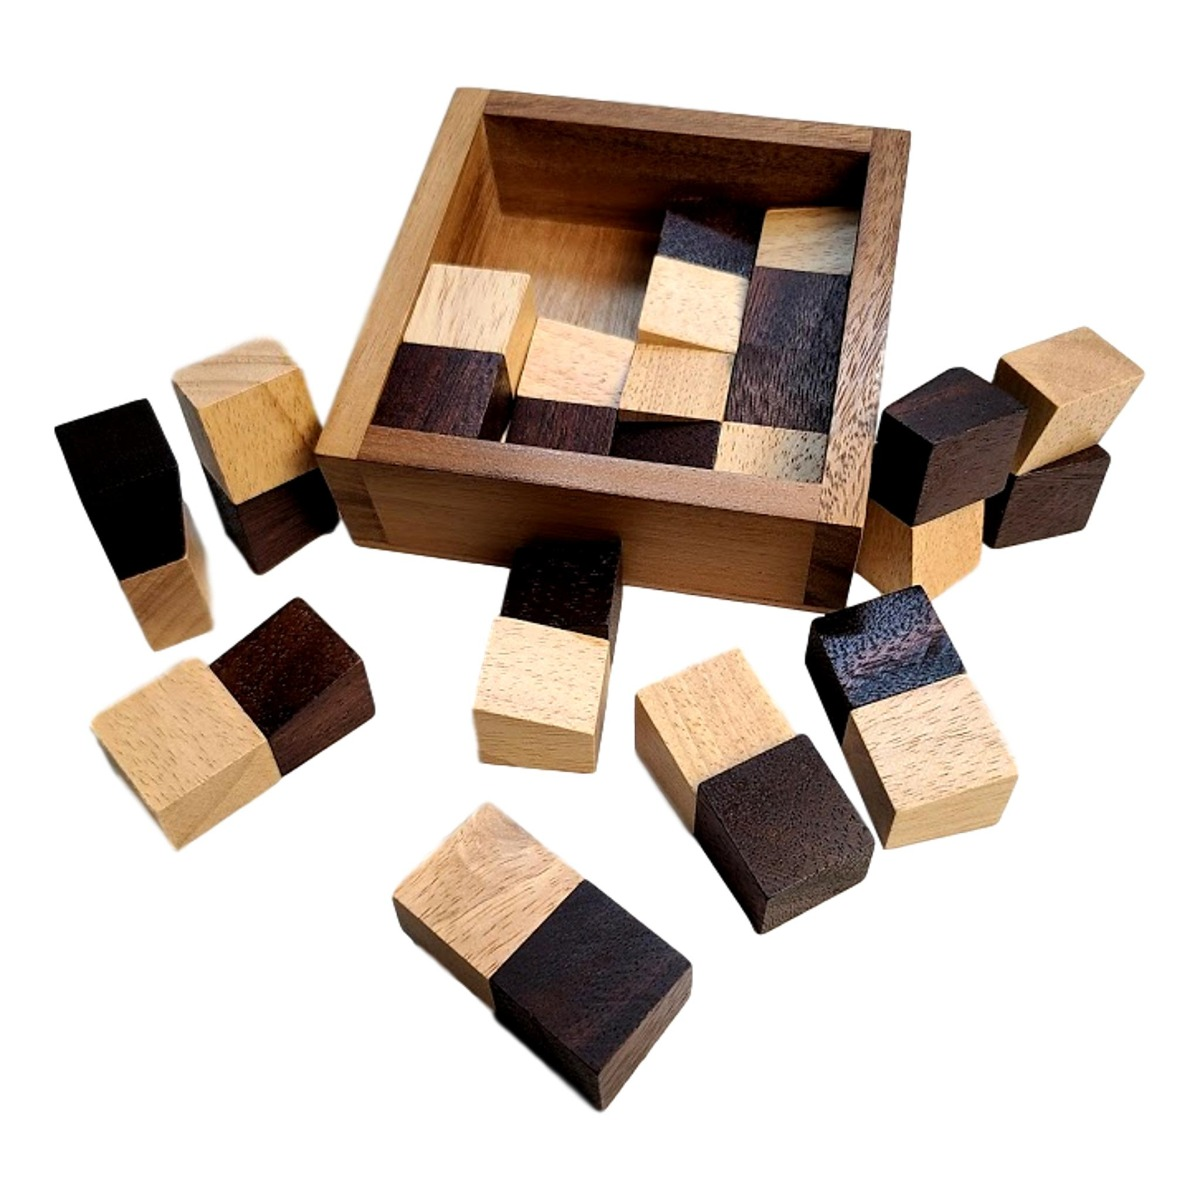 Devils Chessboard wood brain teaser puzzle 16pc